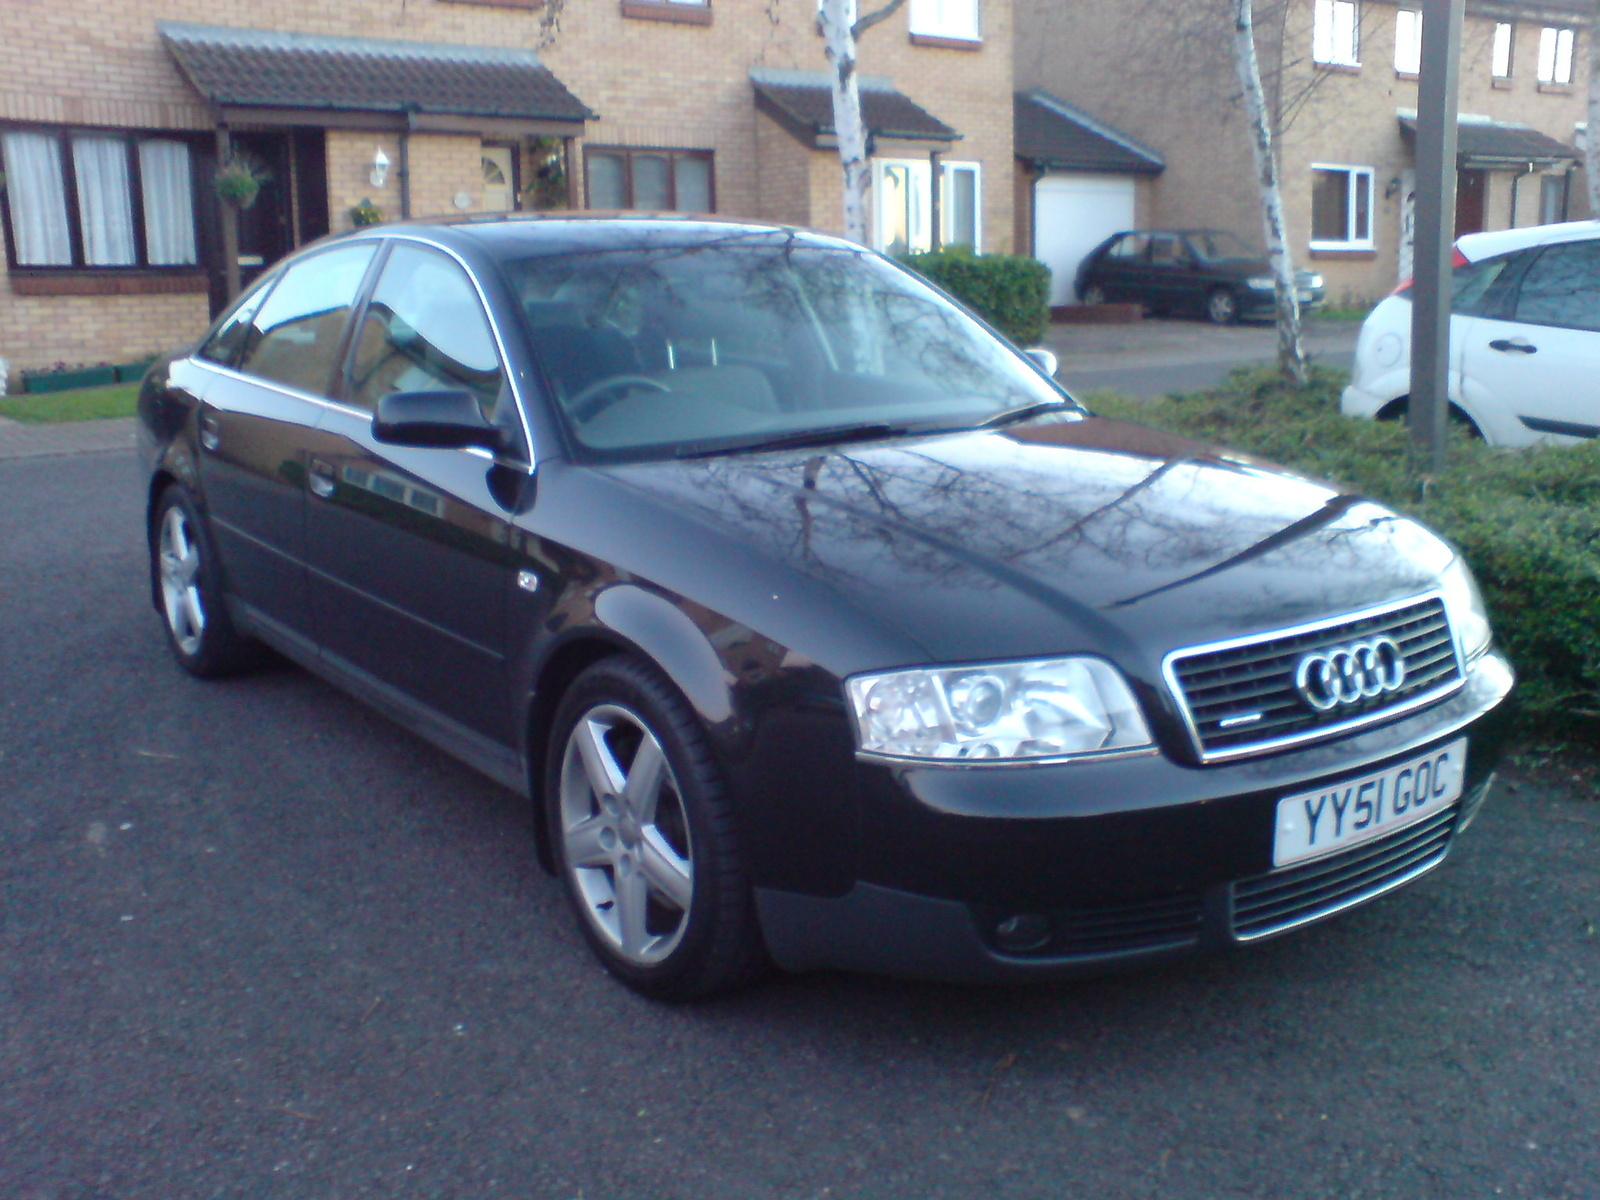 2002 Audi A4 - User Reviews - CarGurus